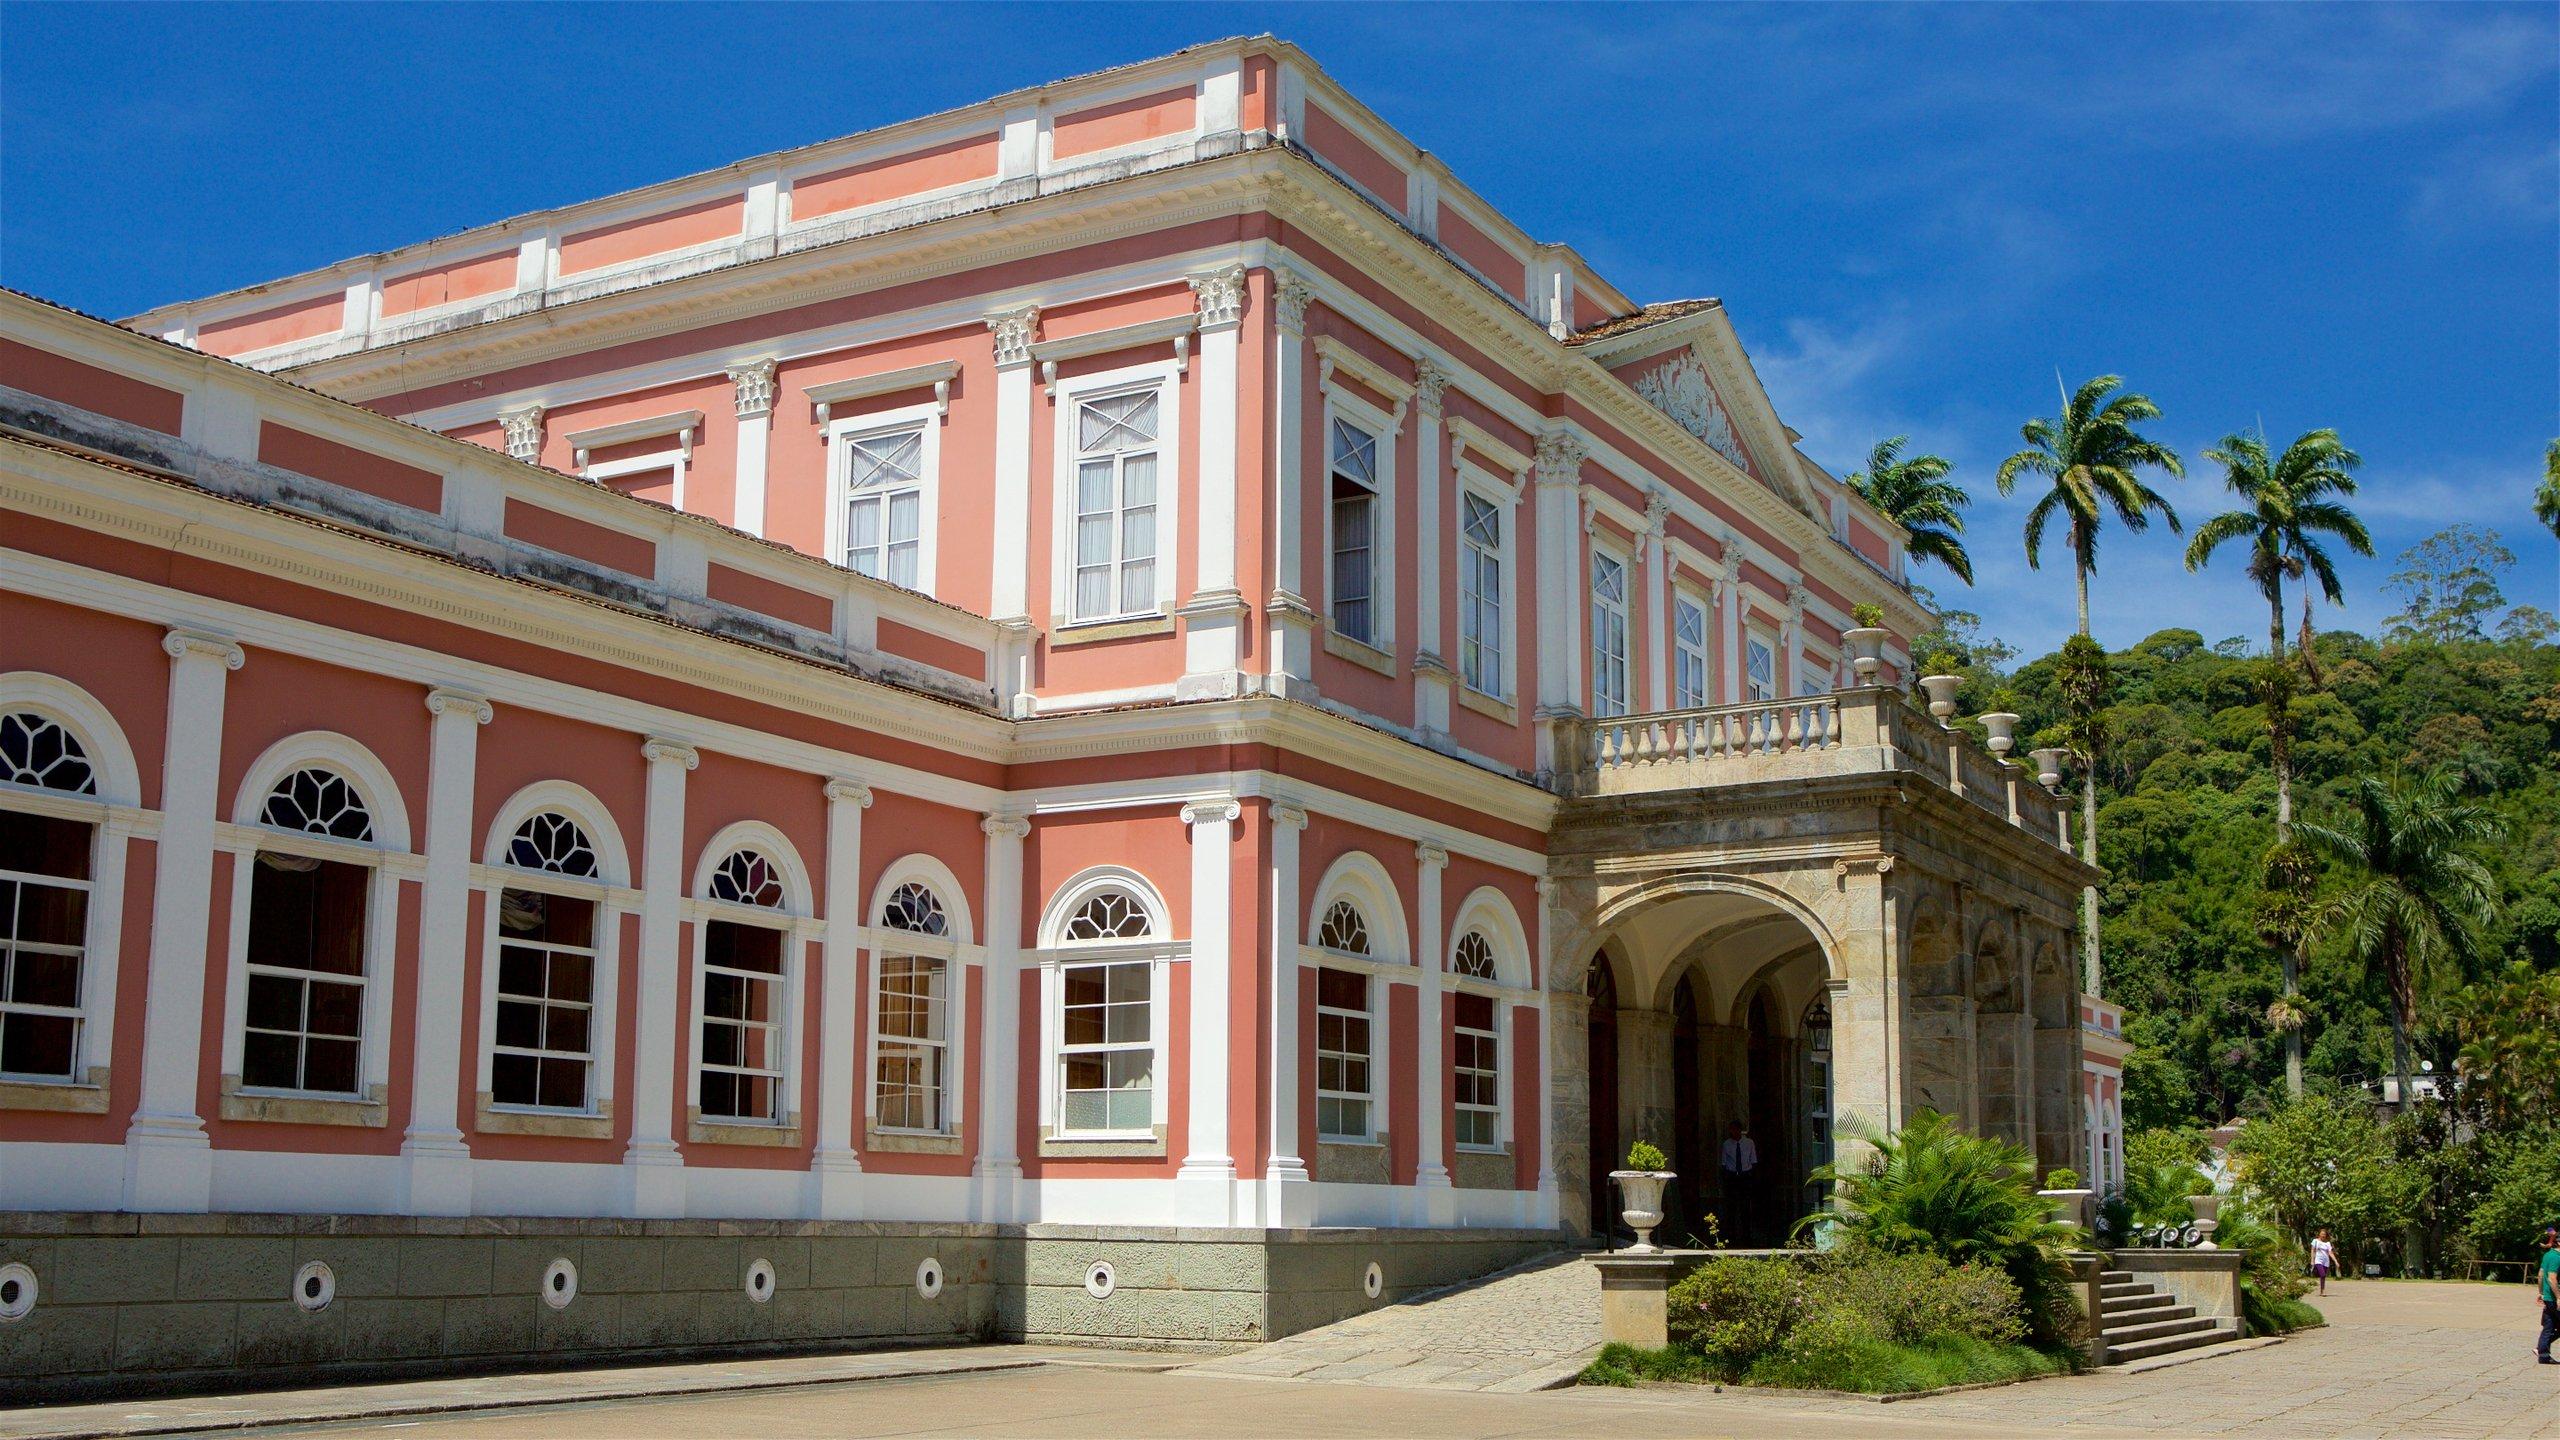 Historic Center, Petropolis, Rio de Janeiro State, Brazil